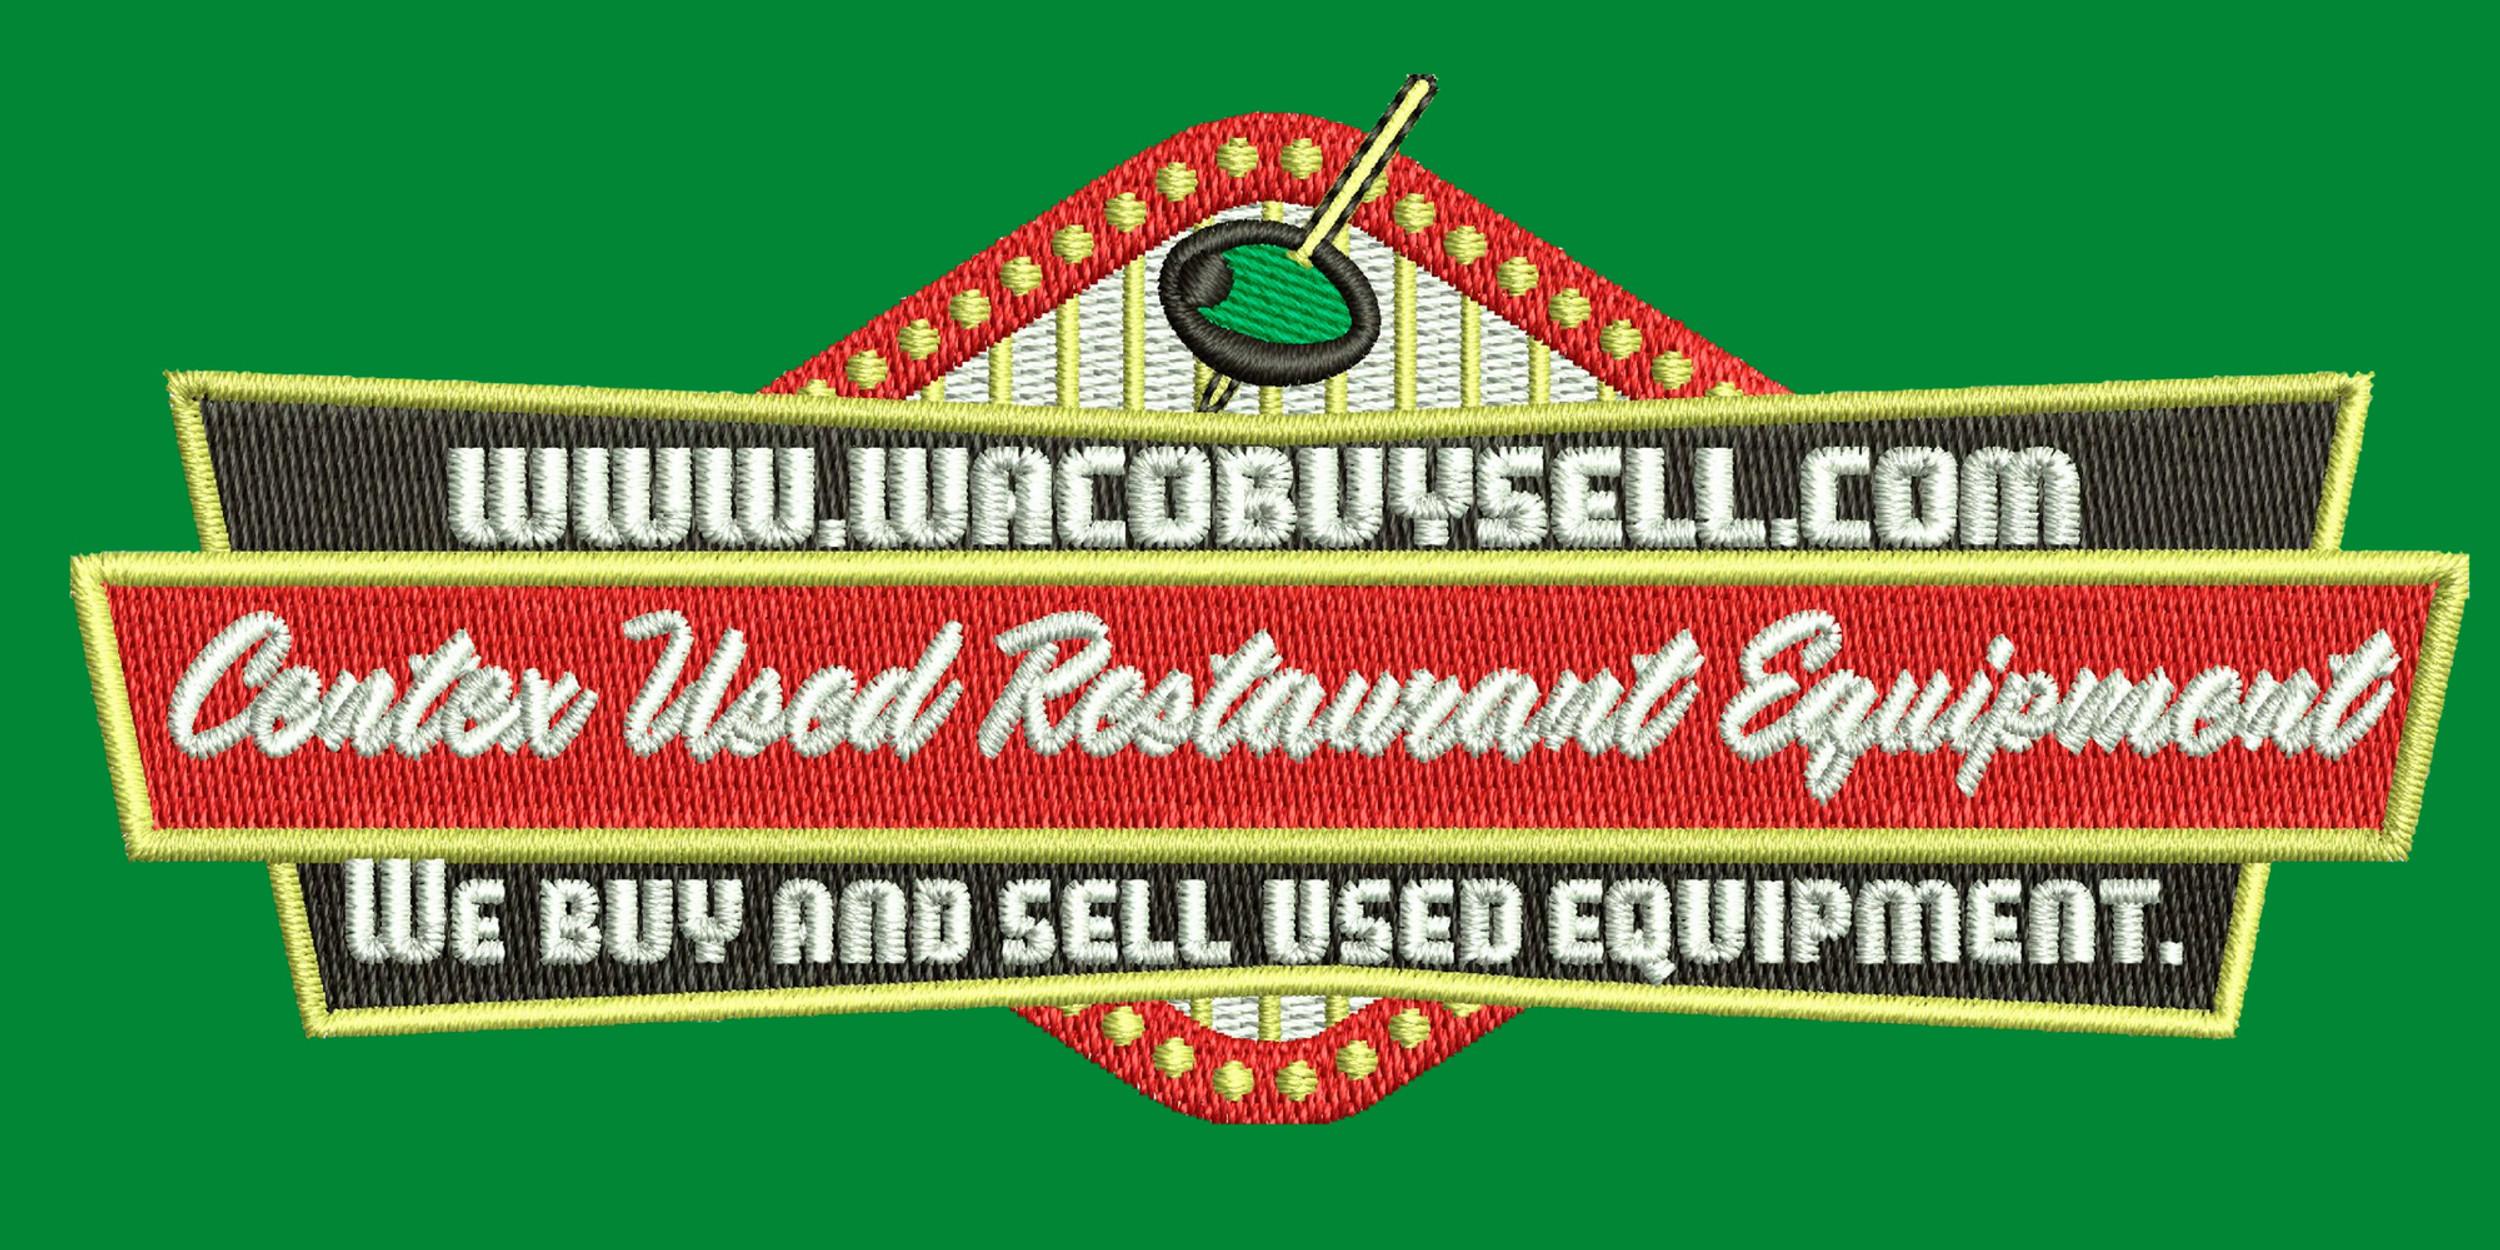 Quality Used Restaurant Equipment Waco Tx